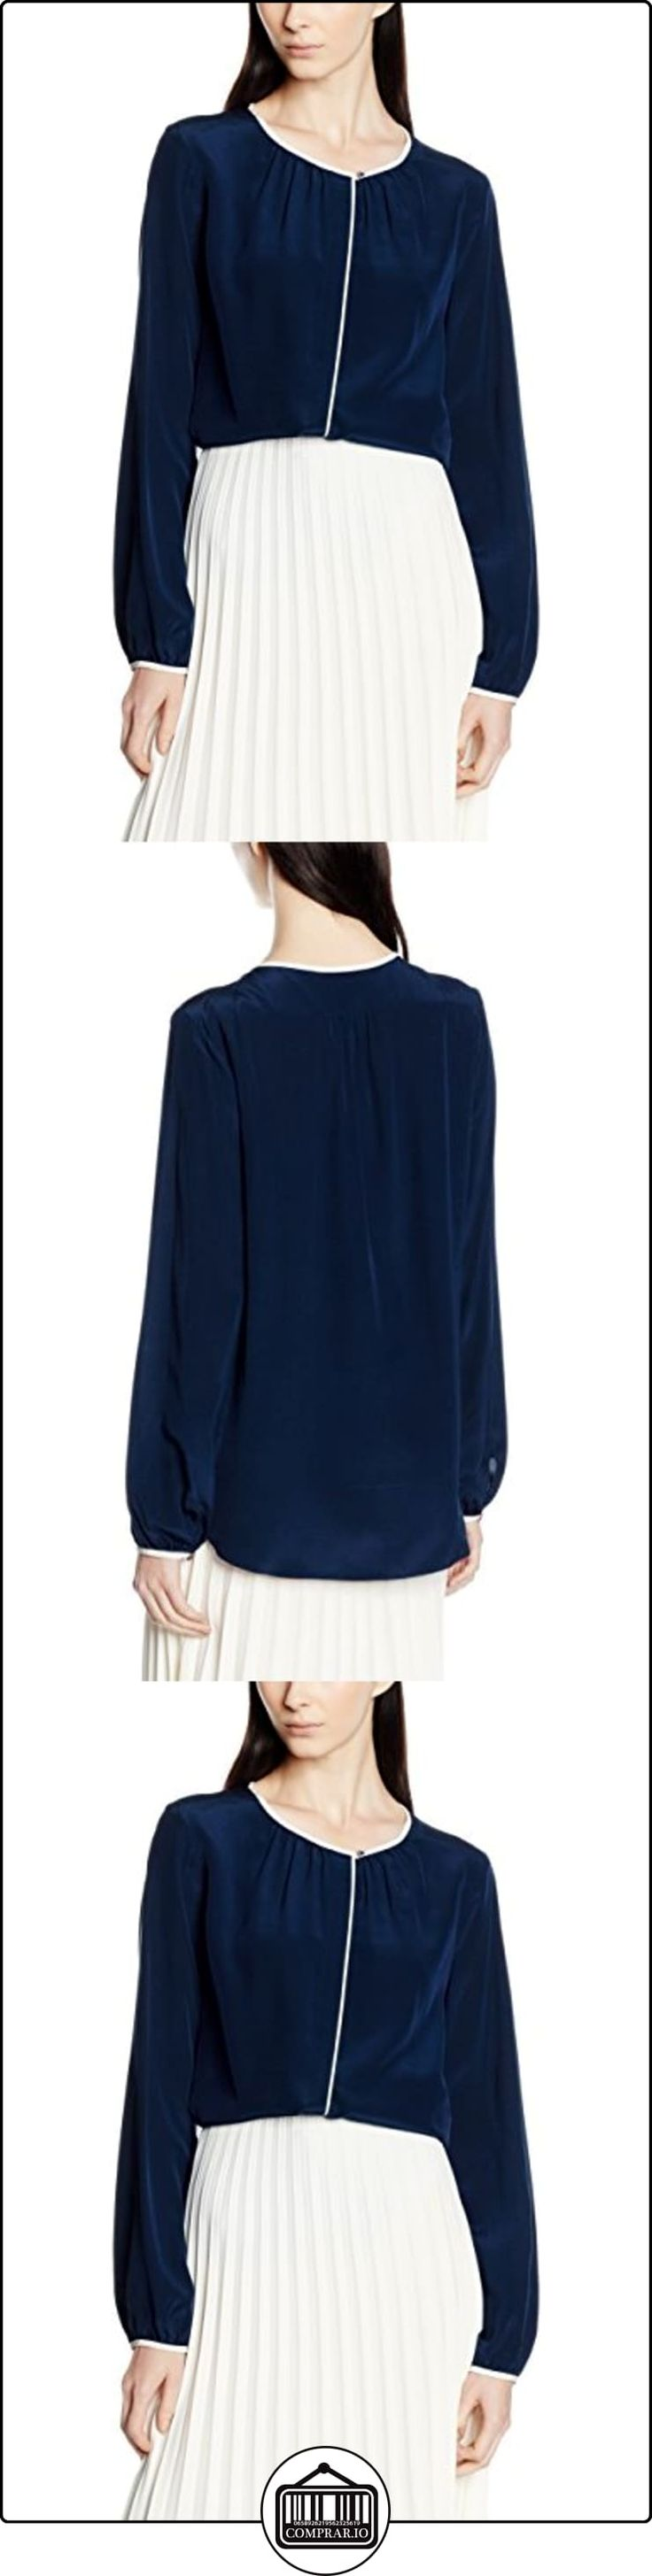 Tommy Hilfiger Renee Silk Blouse LS HG, Blusa para Mujer, Mehrfarbig (Navy Blazer/Eggnog 903), 38  ✿ Blusas y camisas ✿